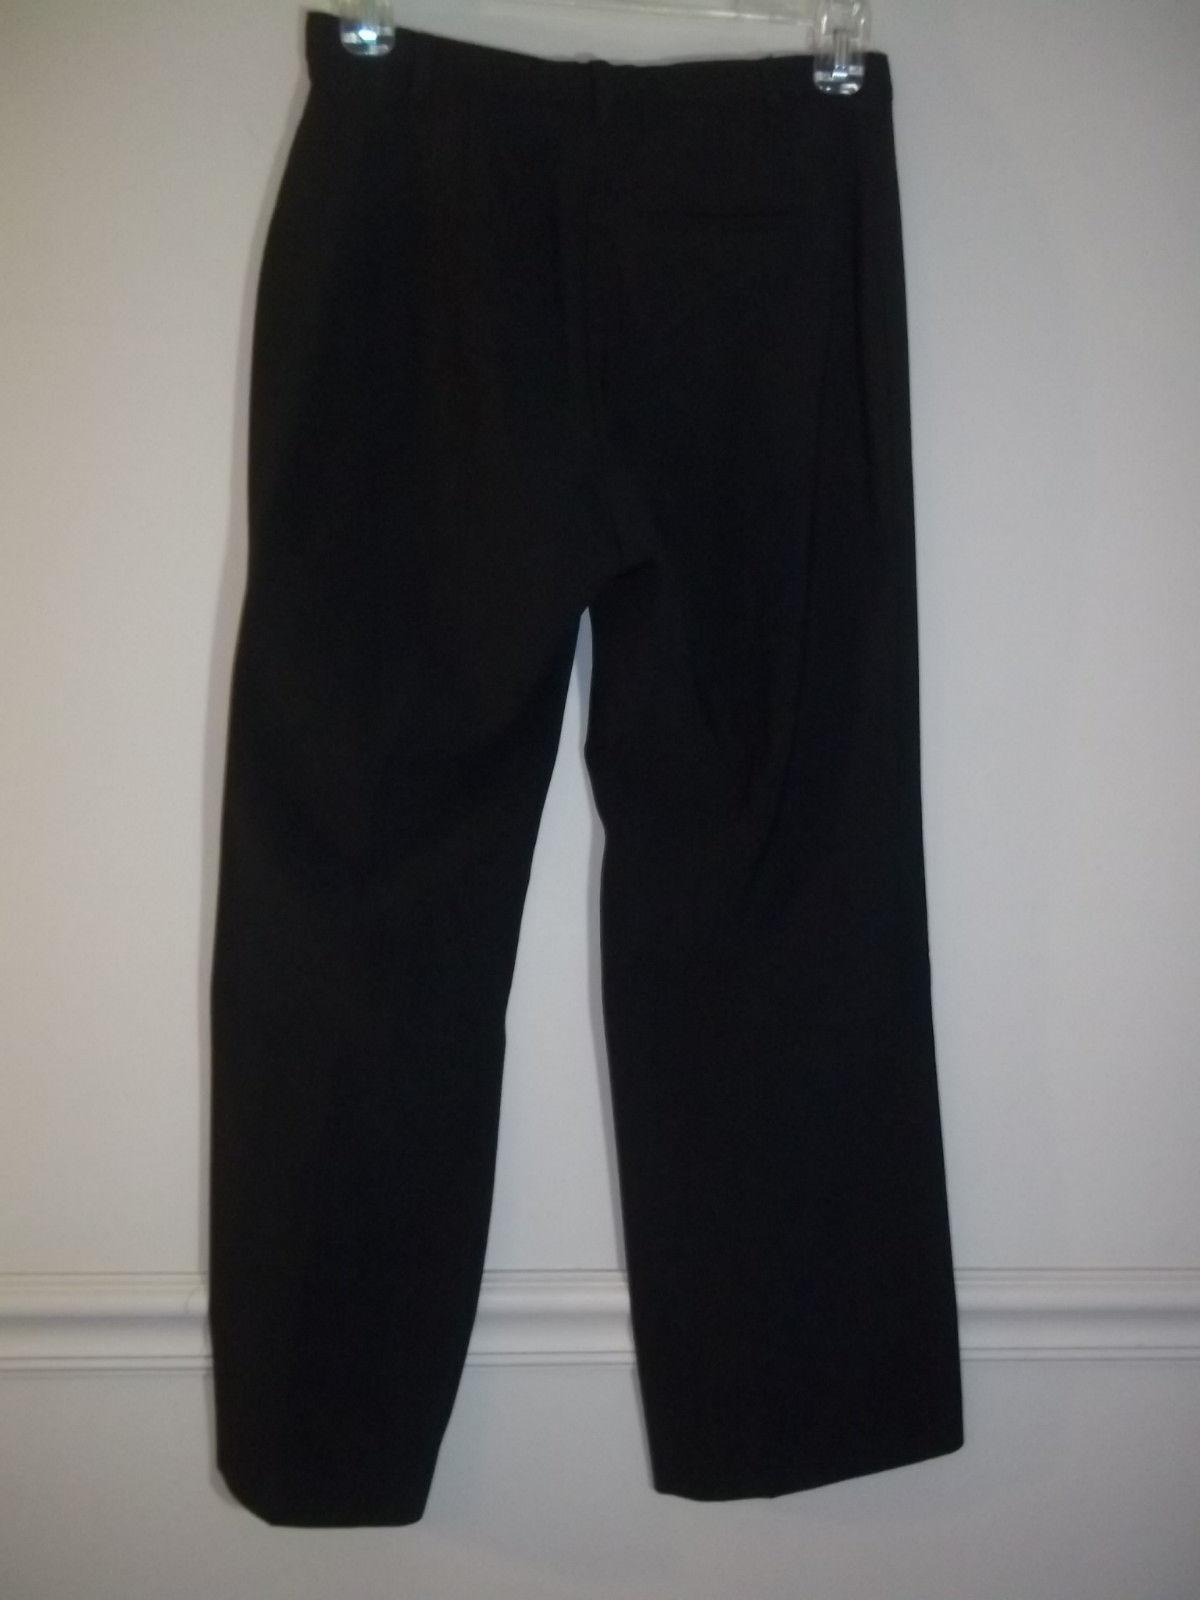 Gap Stretch Womens Black Career Dress Pants Size 2S